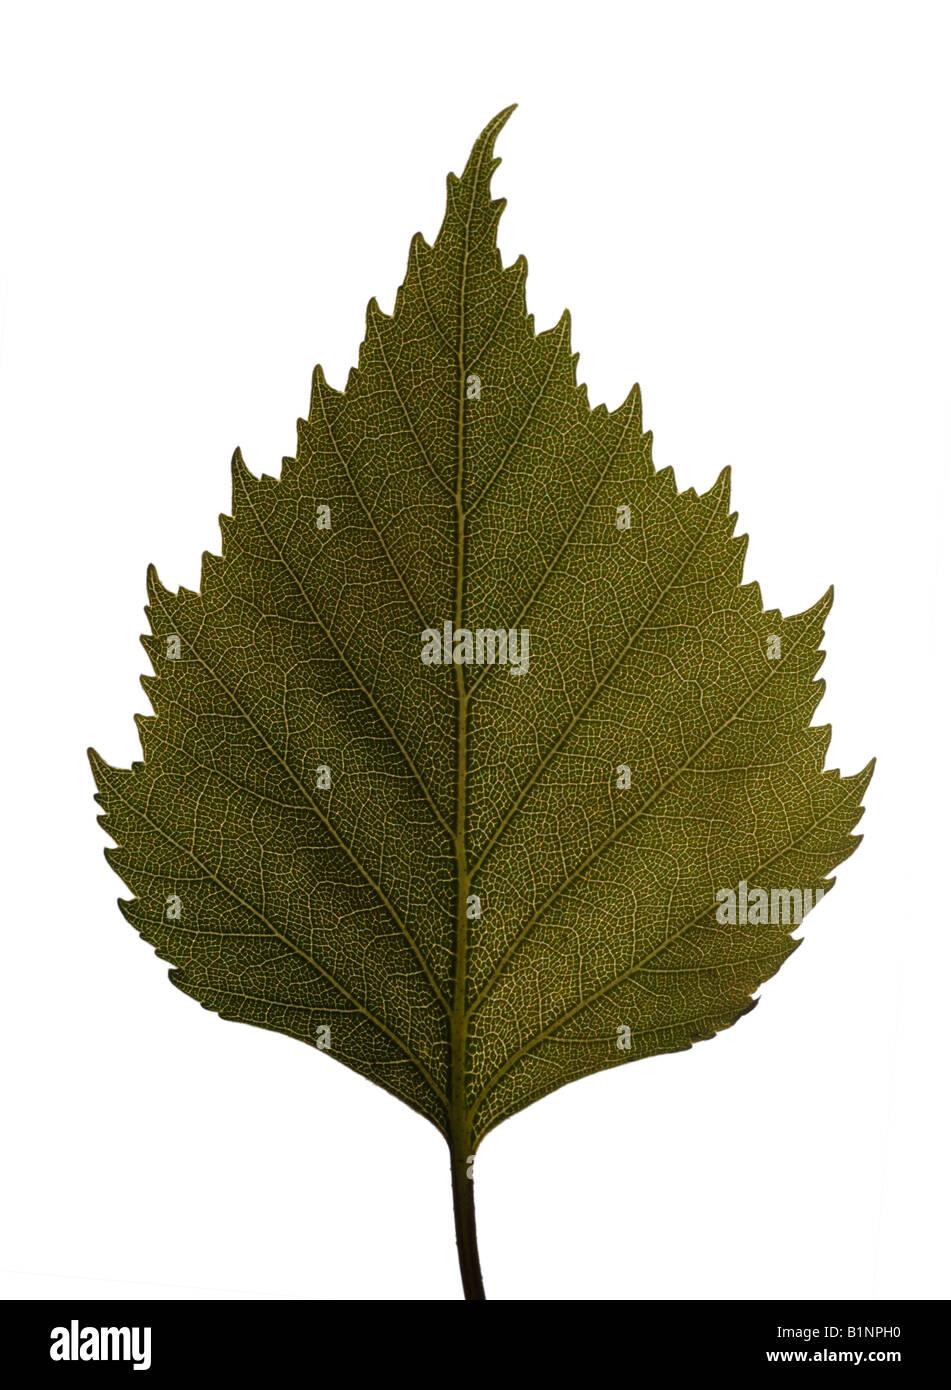 Birke Baum Blatt Stockbild